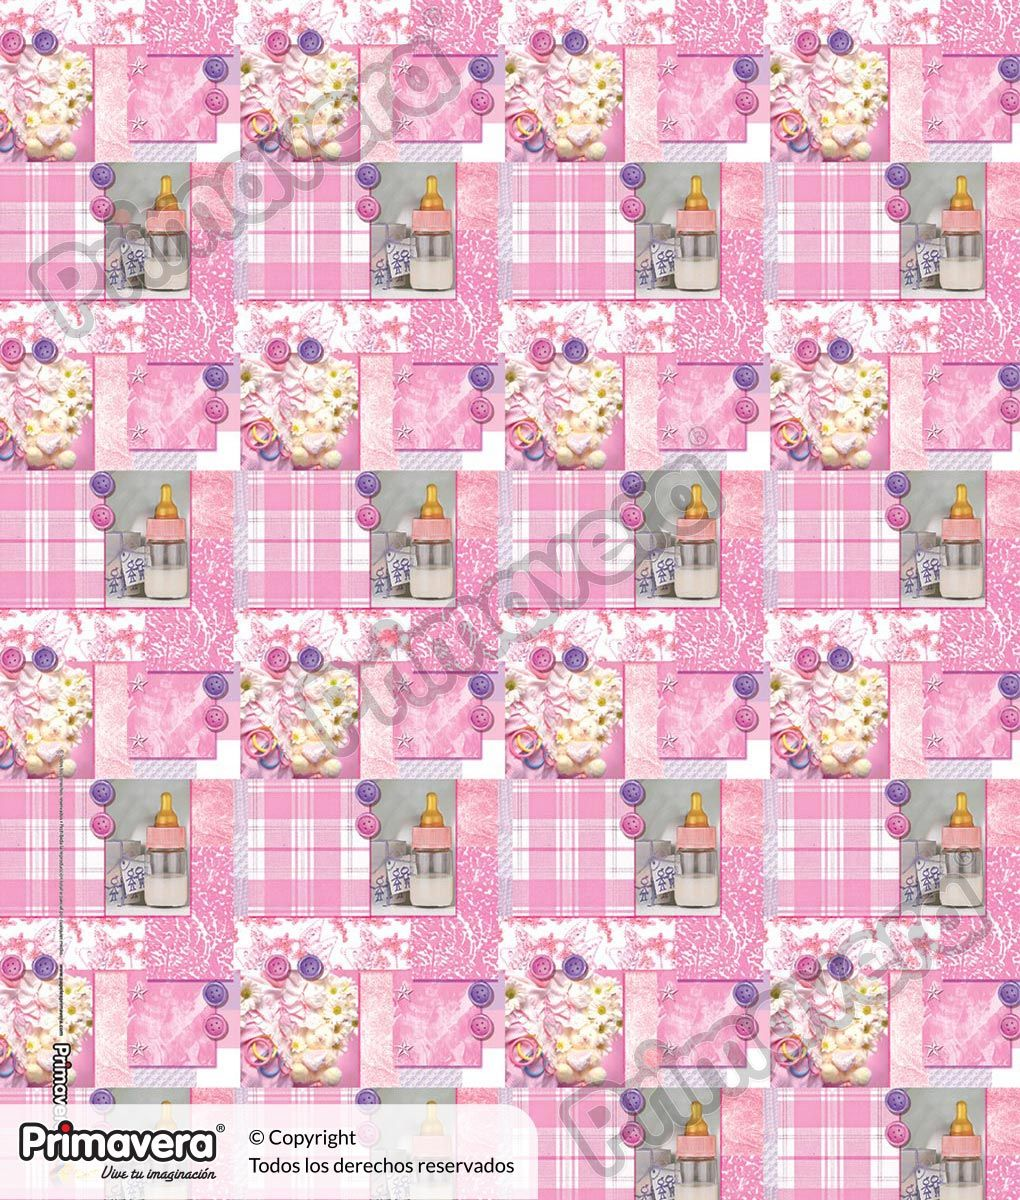 Papel regalo Bebé 1-483-183 http://envoltura.papelesprimavera.com/product/papel-regalo-bebe-1-483-183/